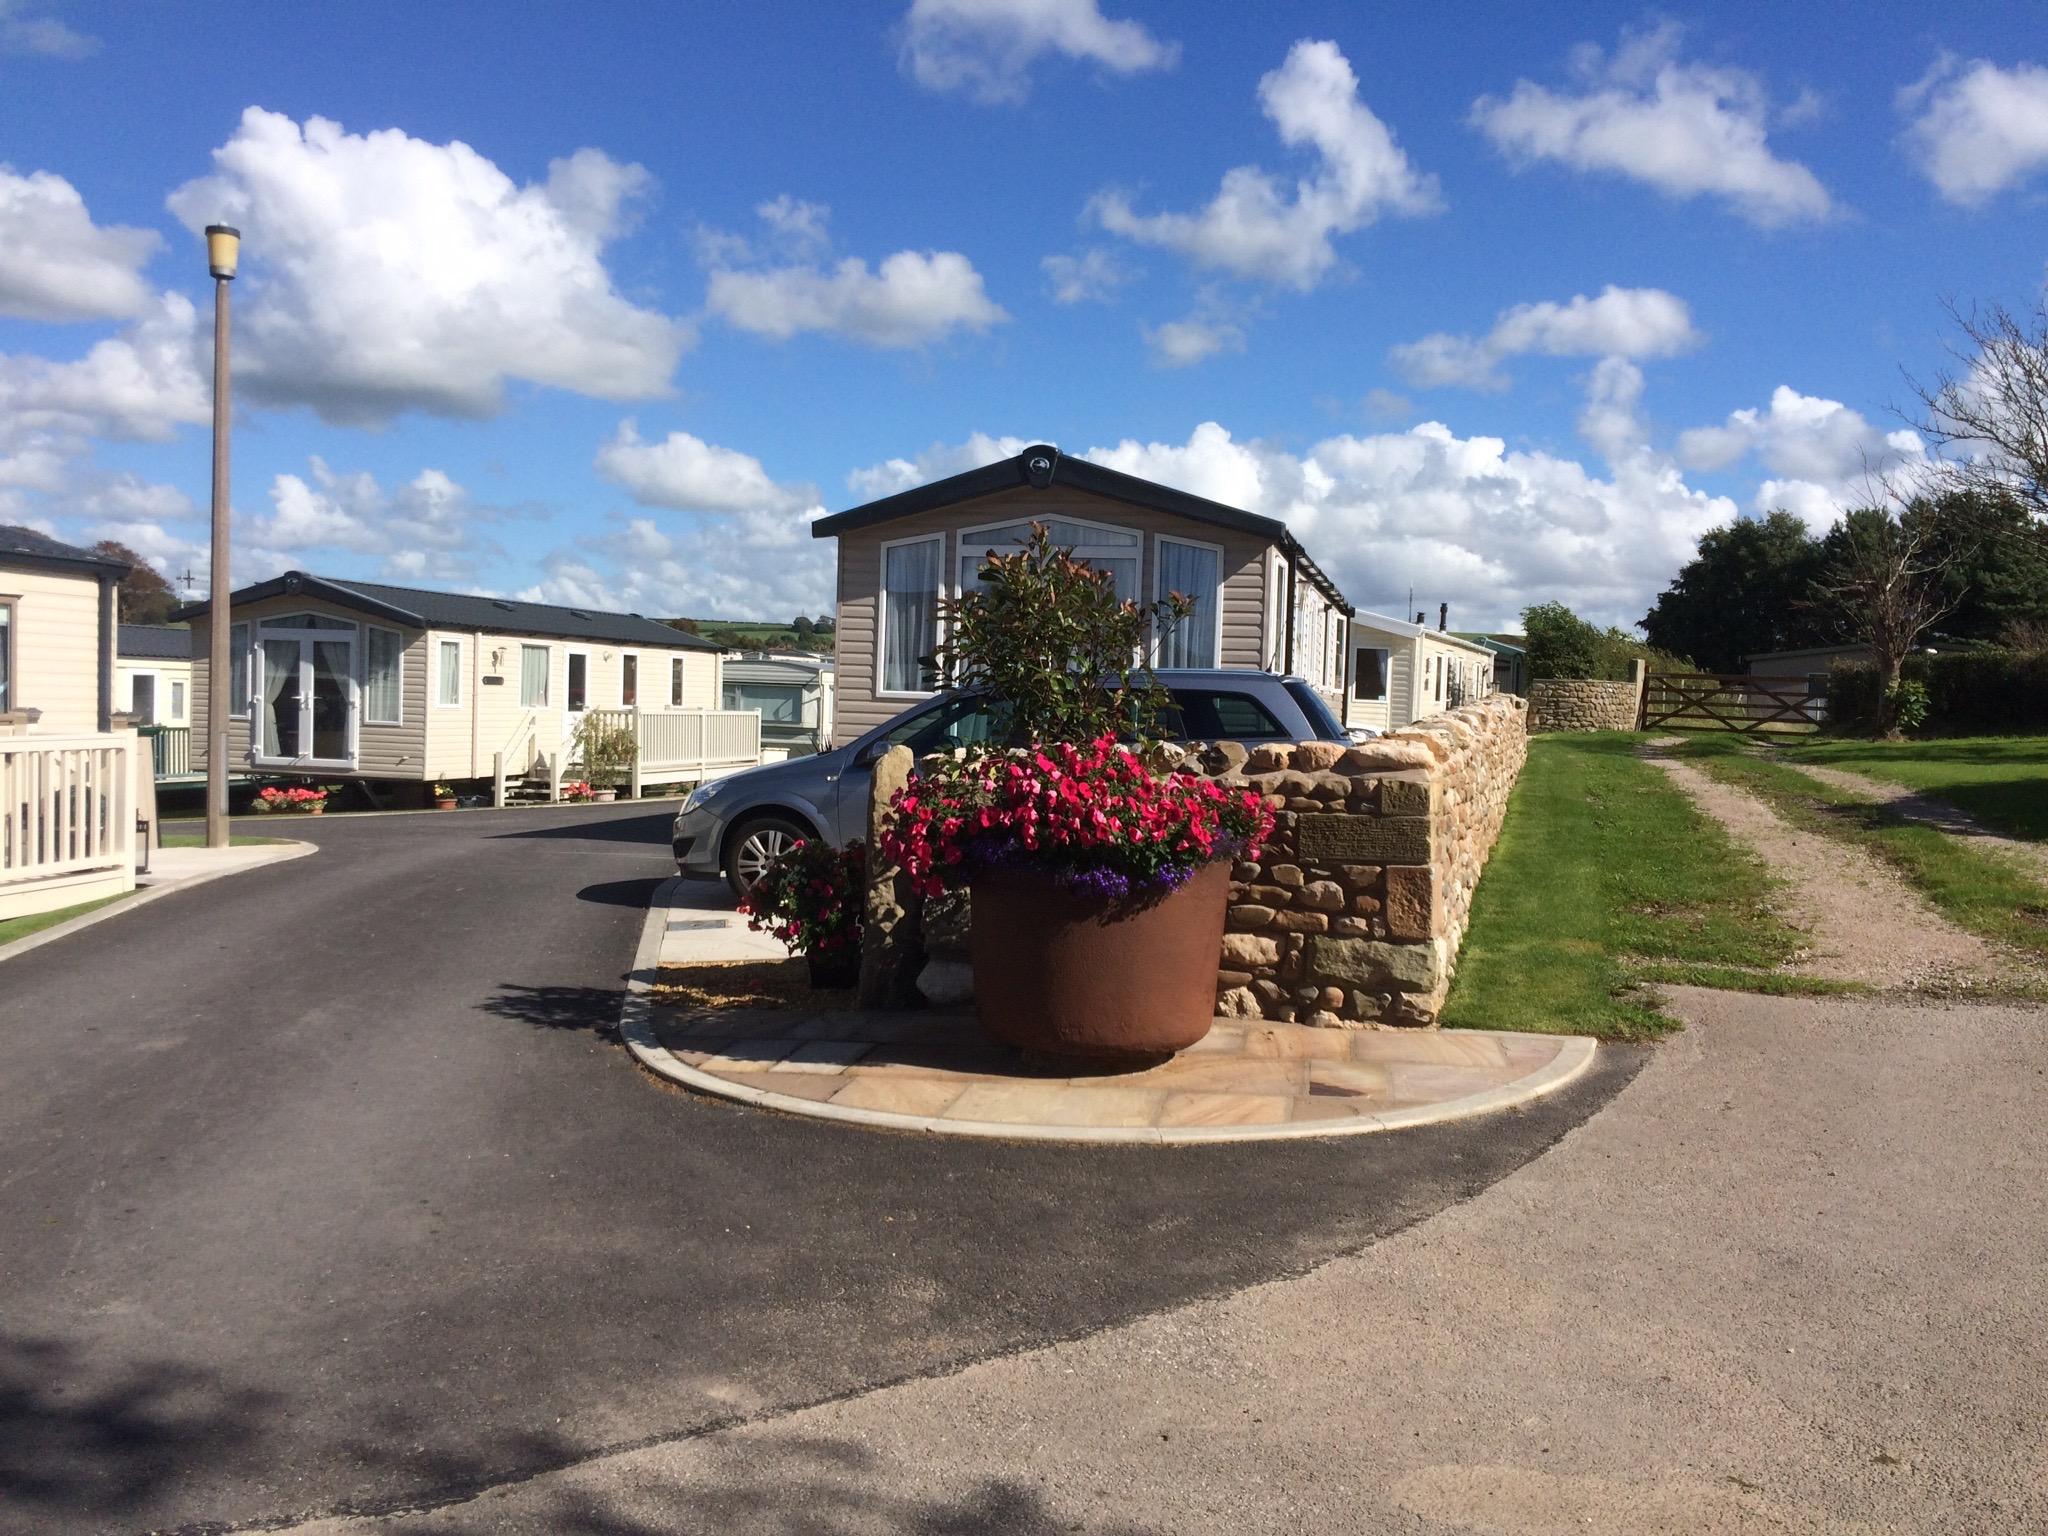 Holiday Homes and Touring Pitches | Morecambe Lodge Caravan